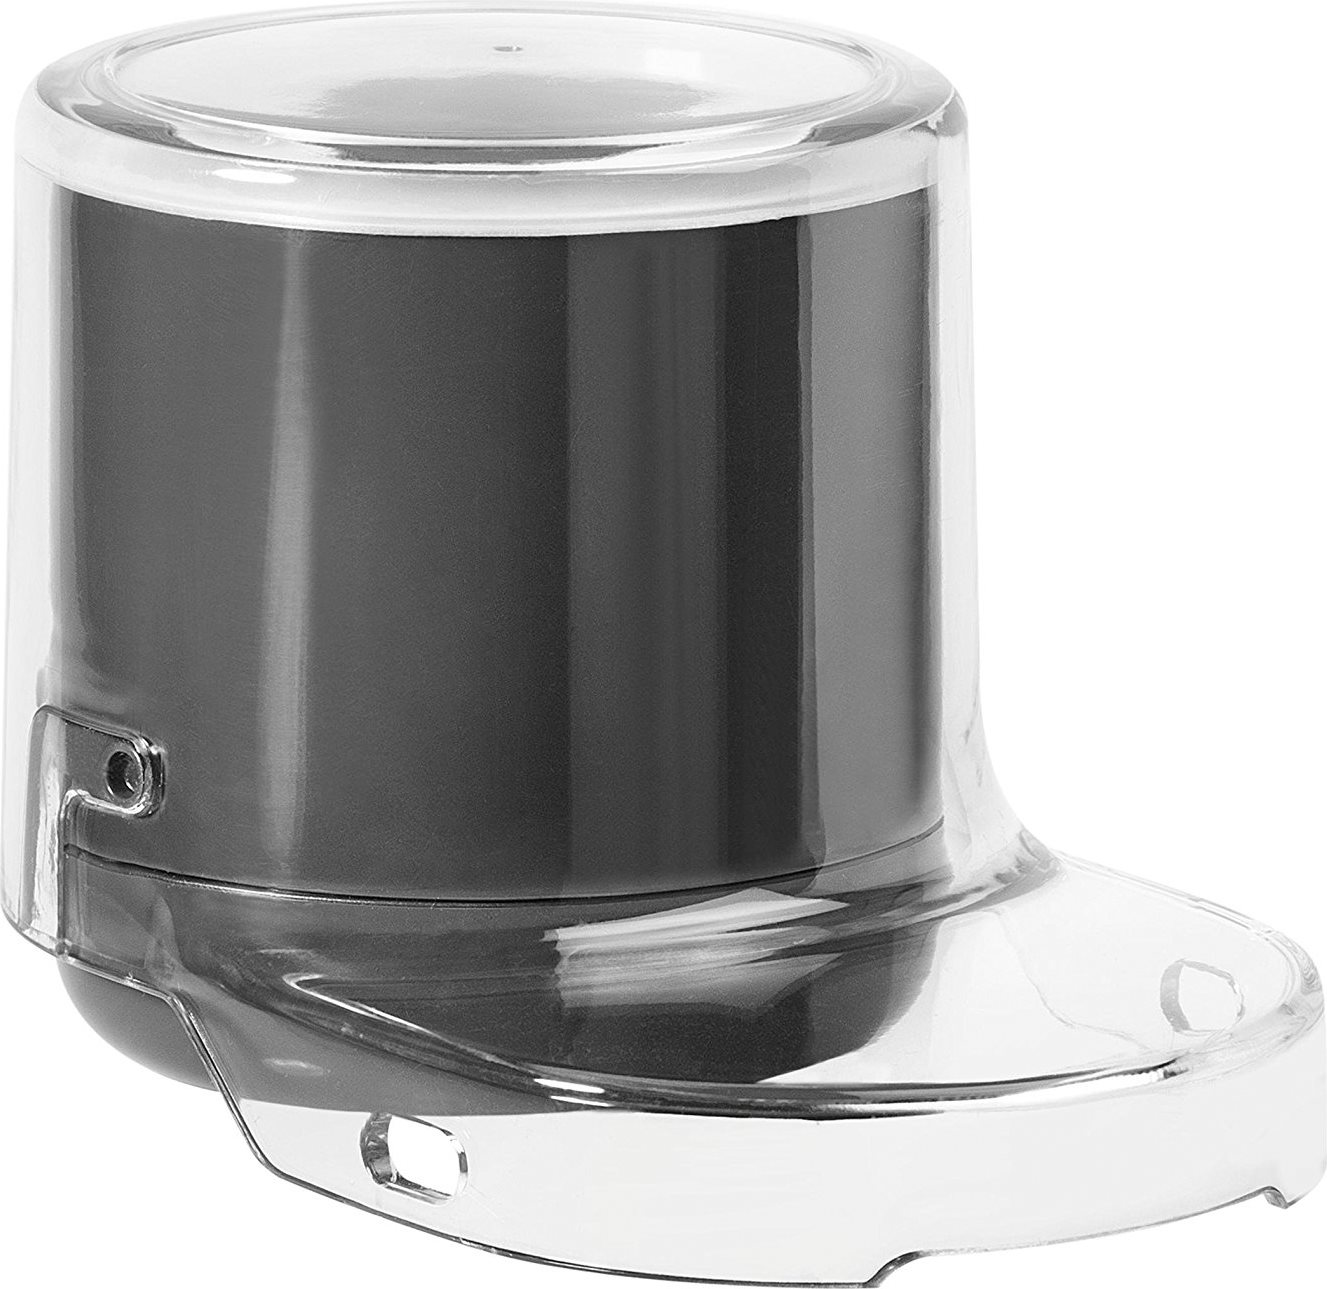 Moulinex robot da cucina impastatrice potenza 1000 watt capacit recipiente 3 litri bicchiere - Robot da cucina moulinex ...